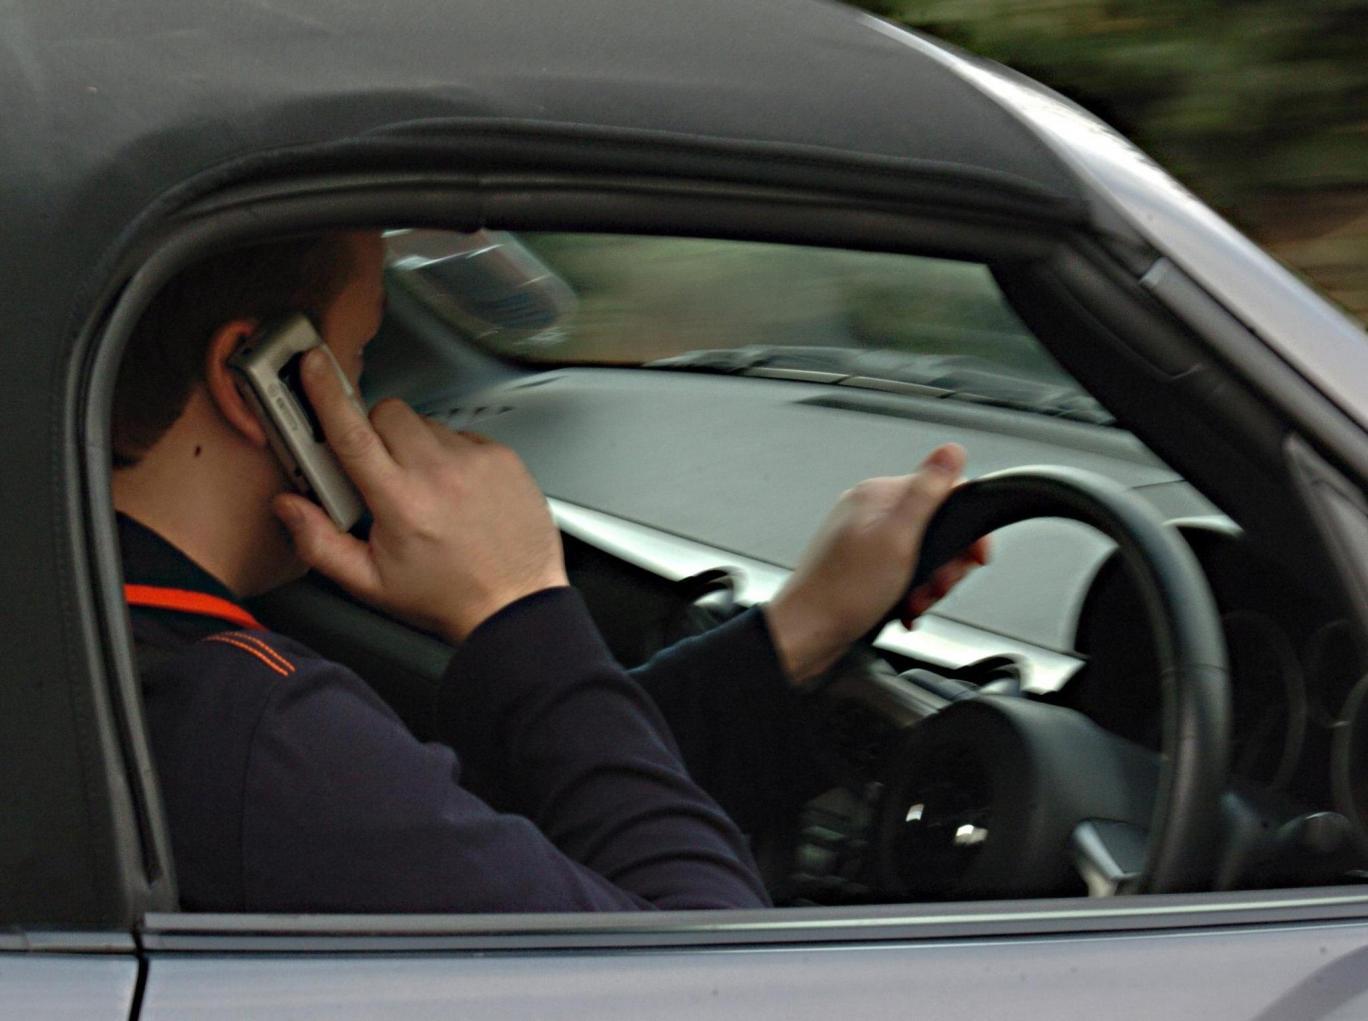 pa-mobile-phone-driving-handheld